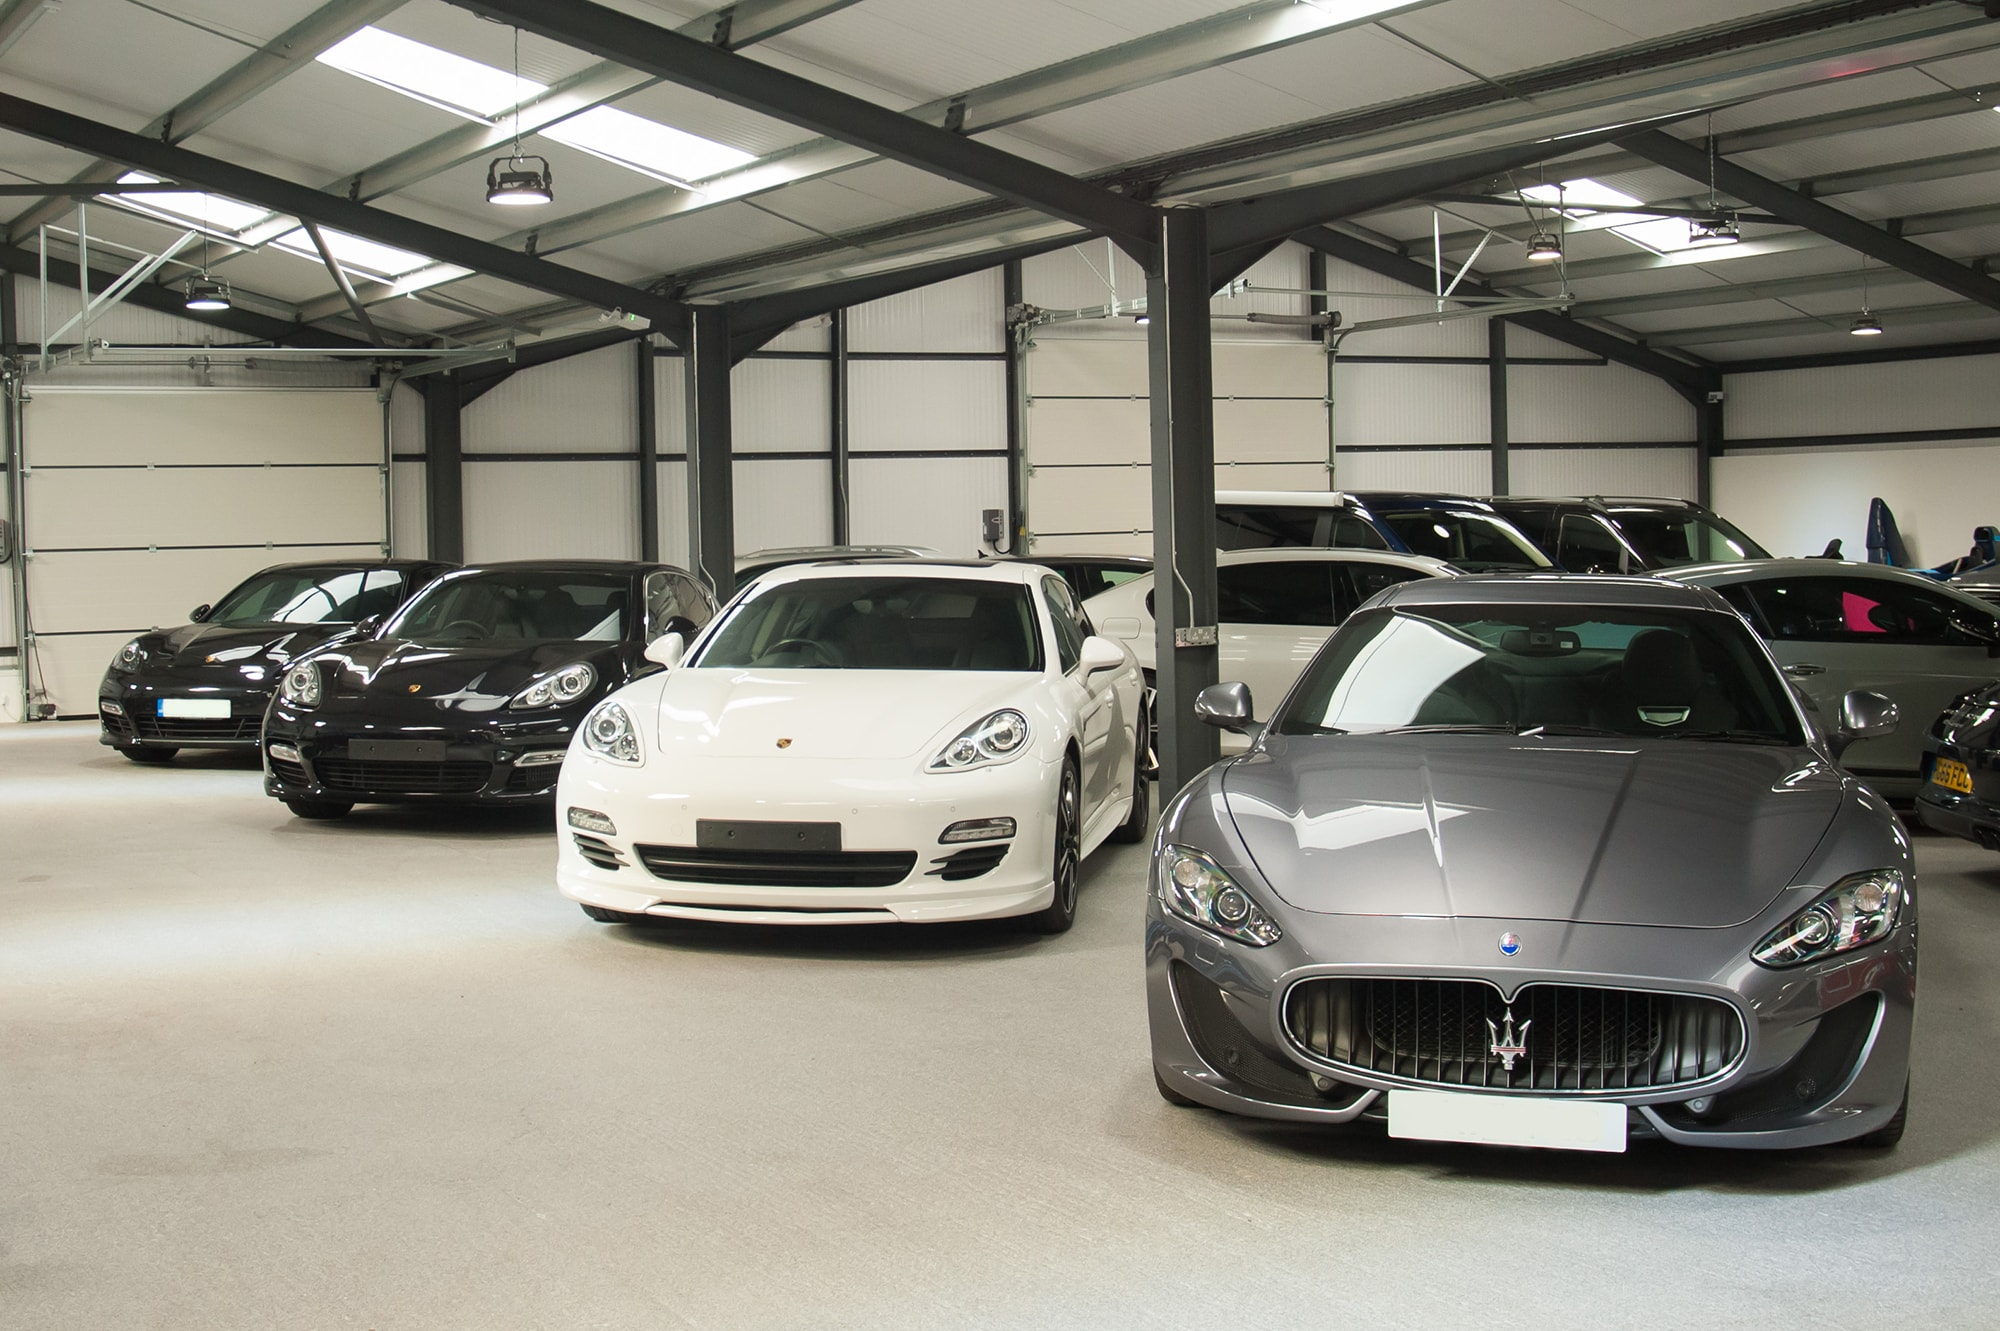 Bramshaw Group Cars